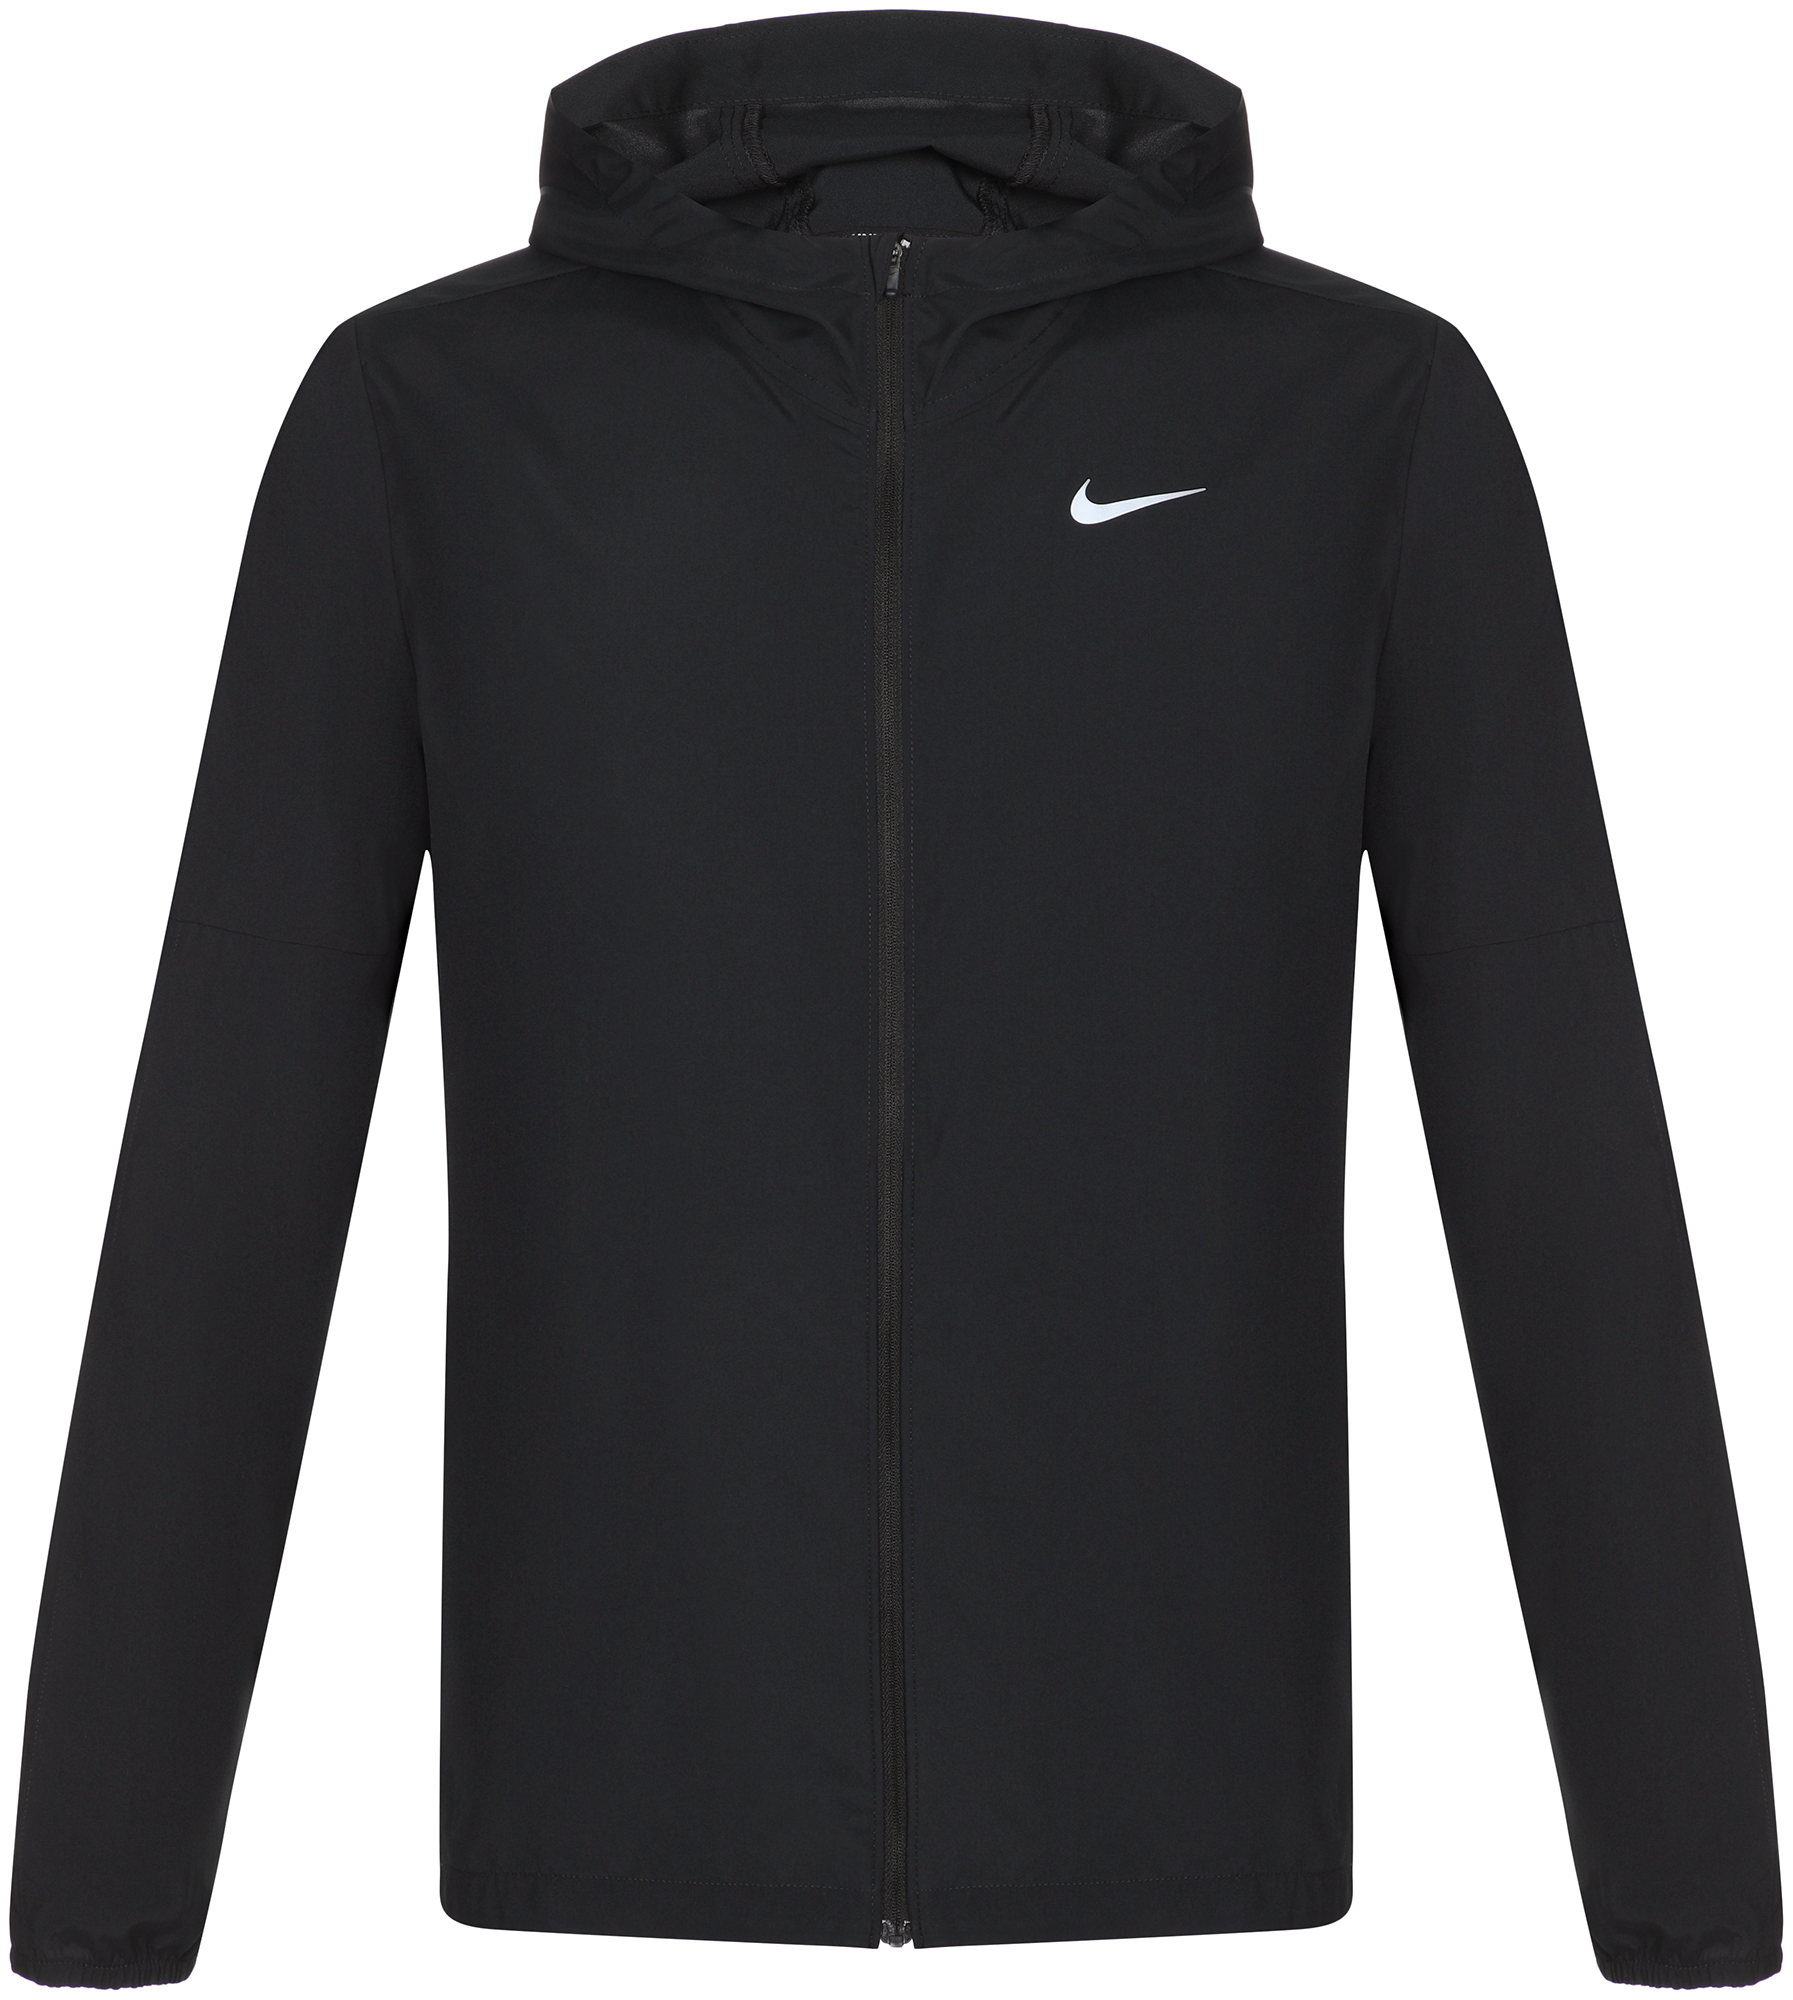 цена Nike Ветровка мужская Nike Run Stripe, размер 44-46 онлайн в 2017 году